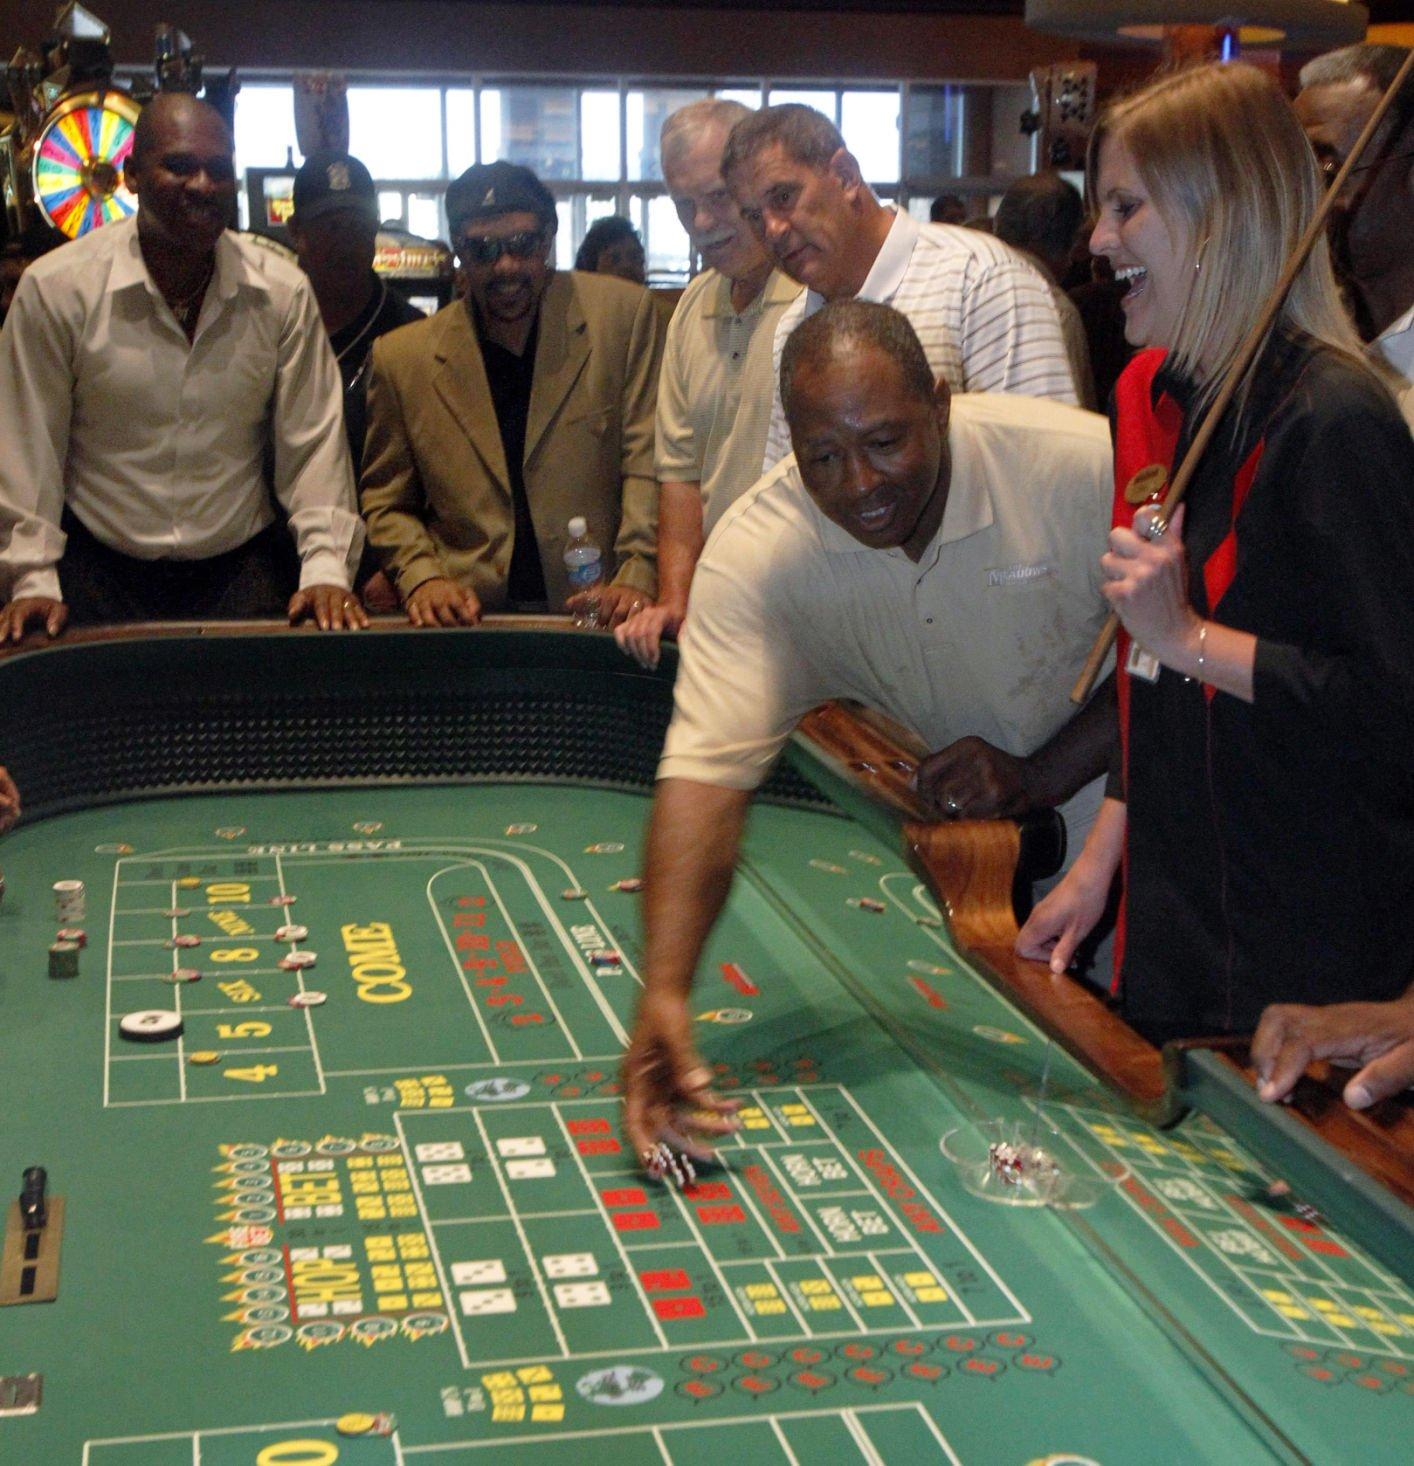 Casino tribune-democrat chicken dinner gambling